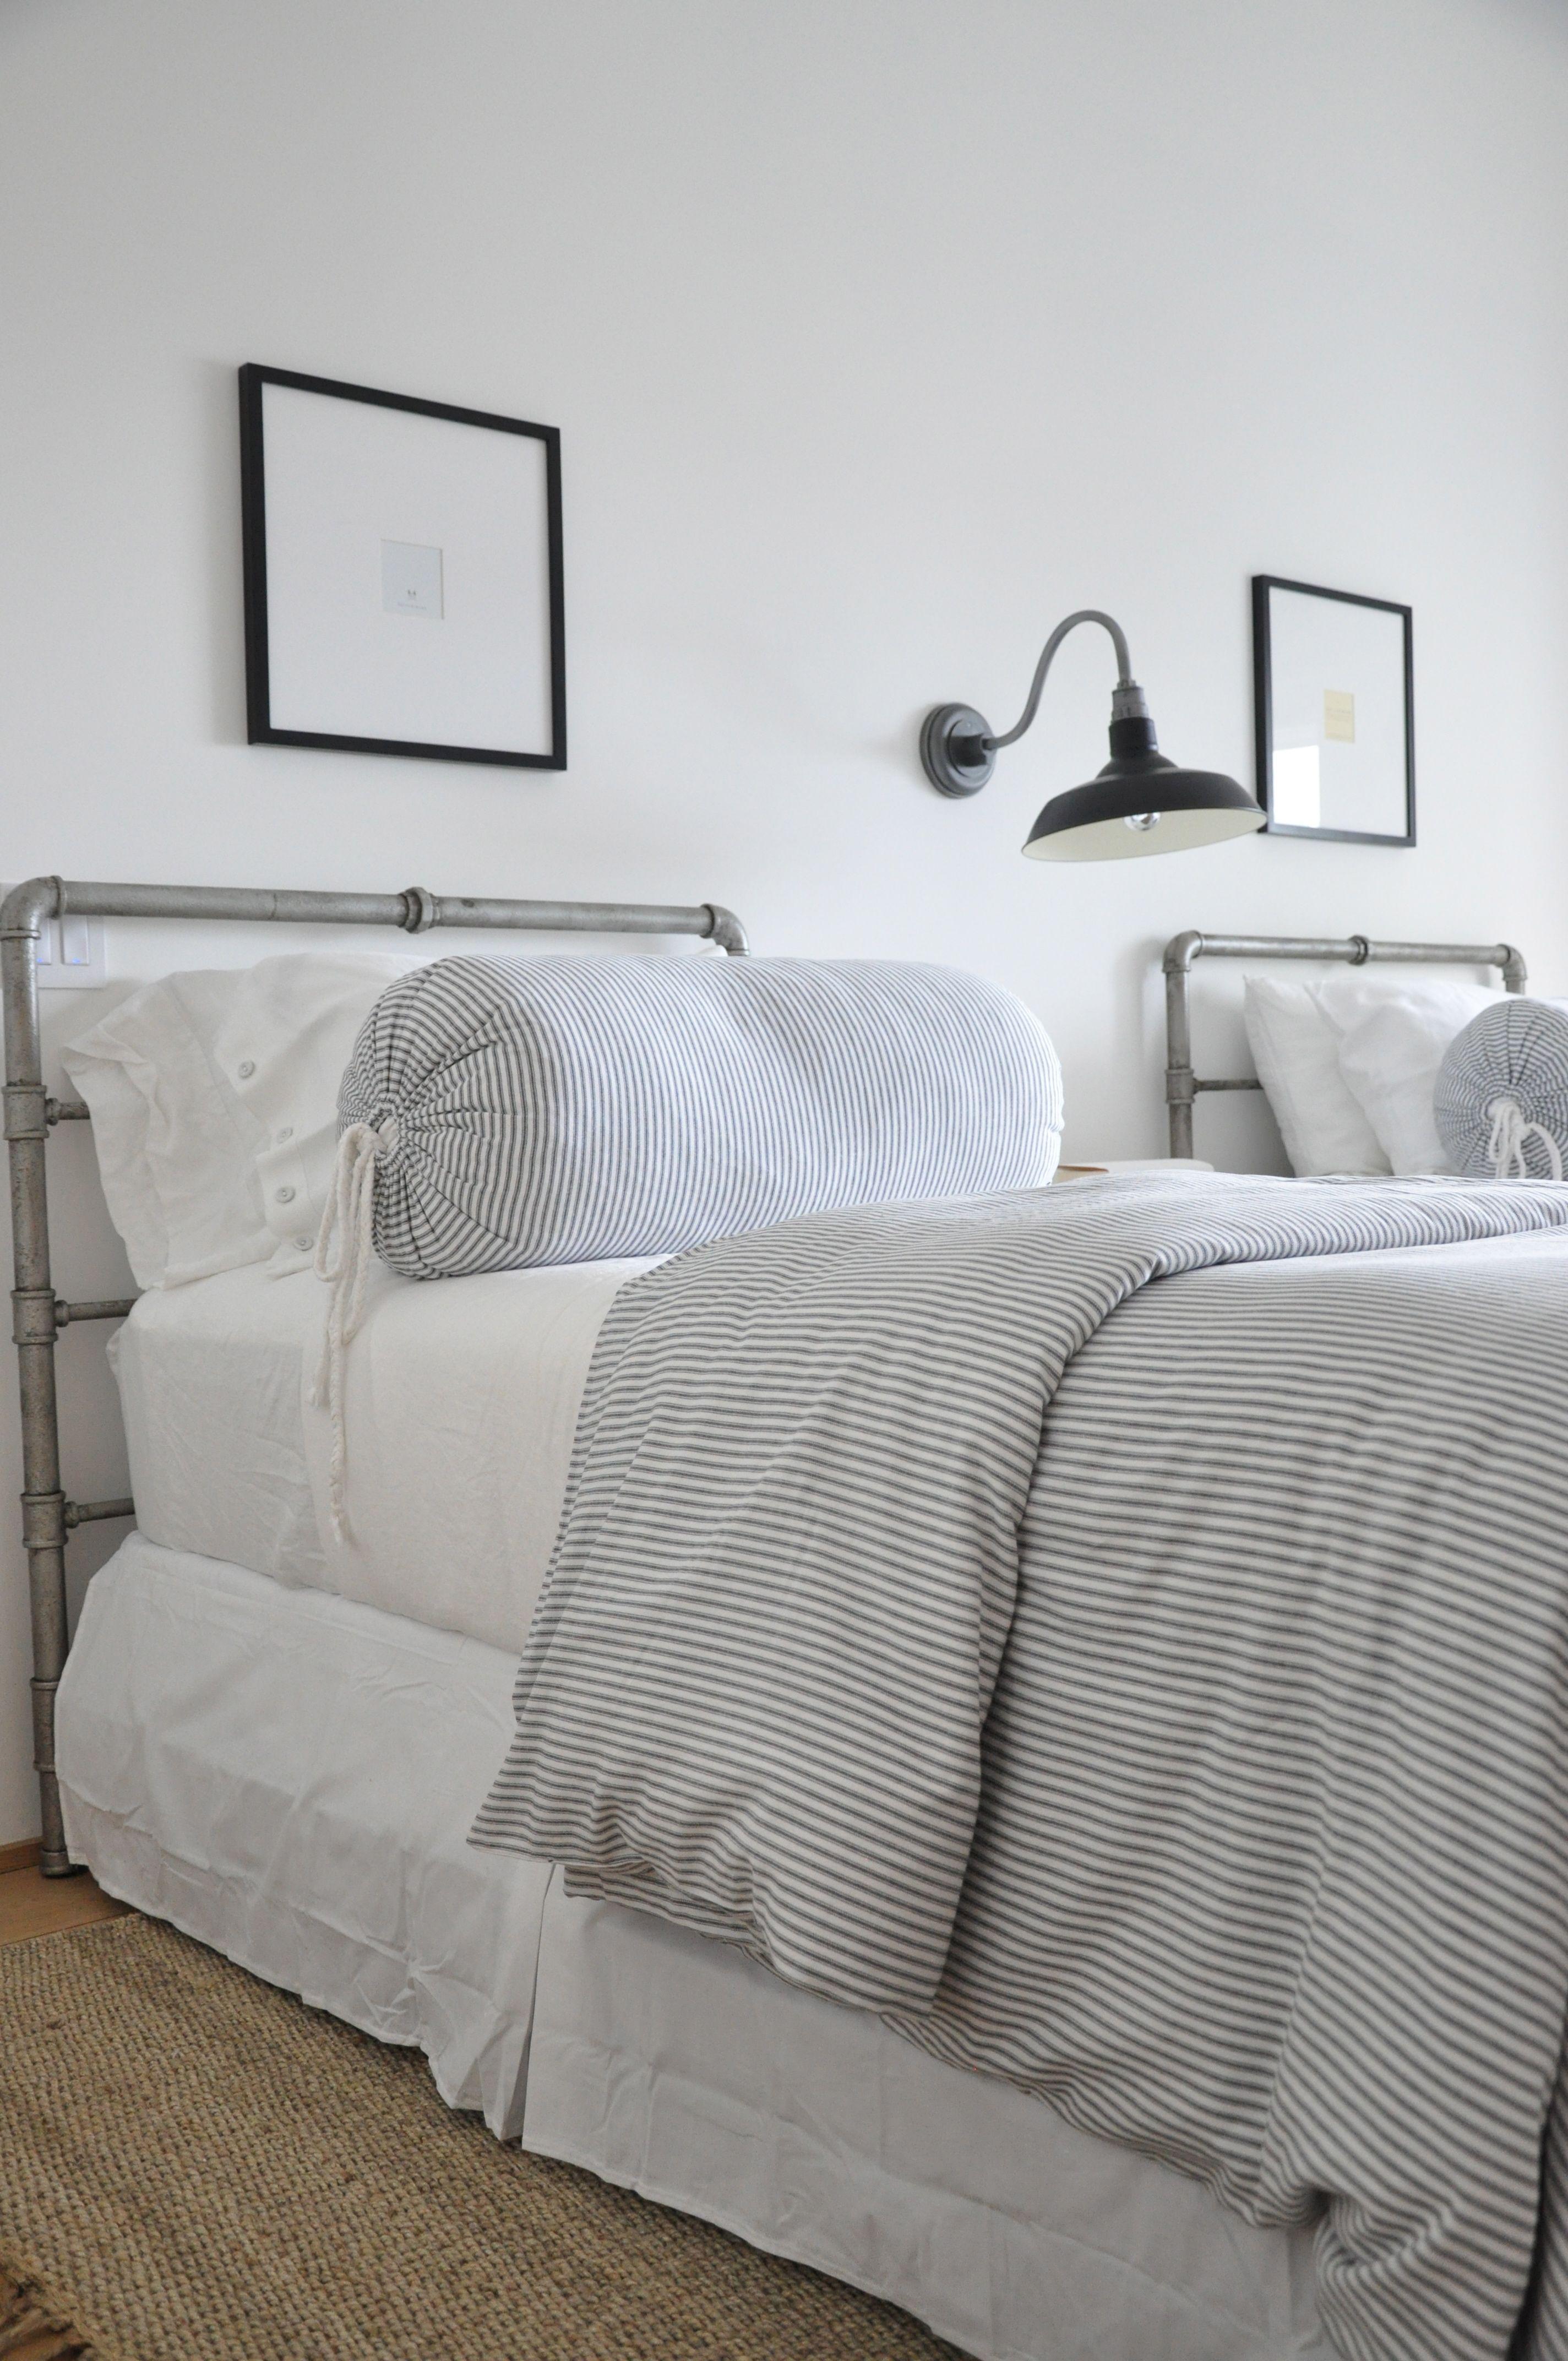 coastalinspired bedroom, twin beds, ticking stripe